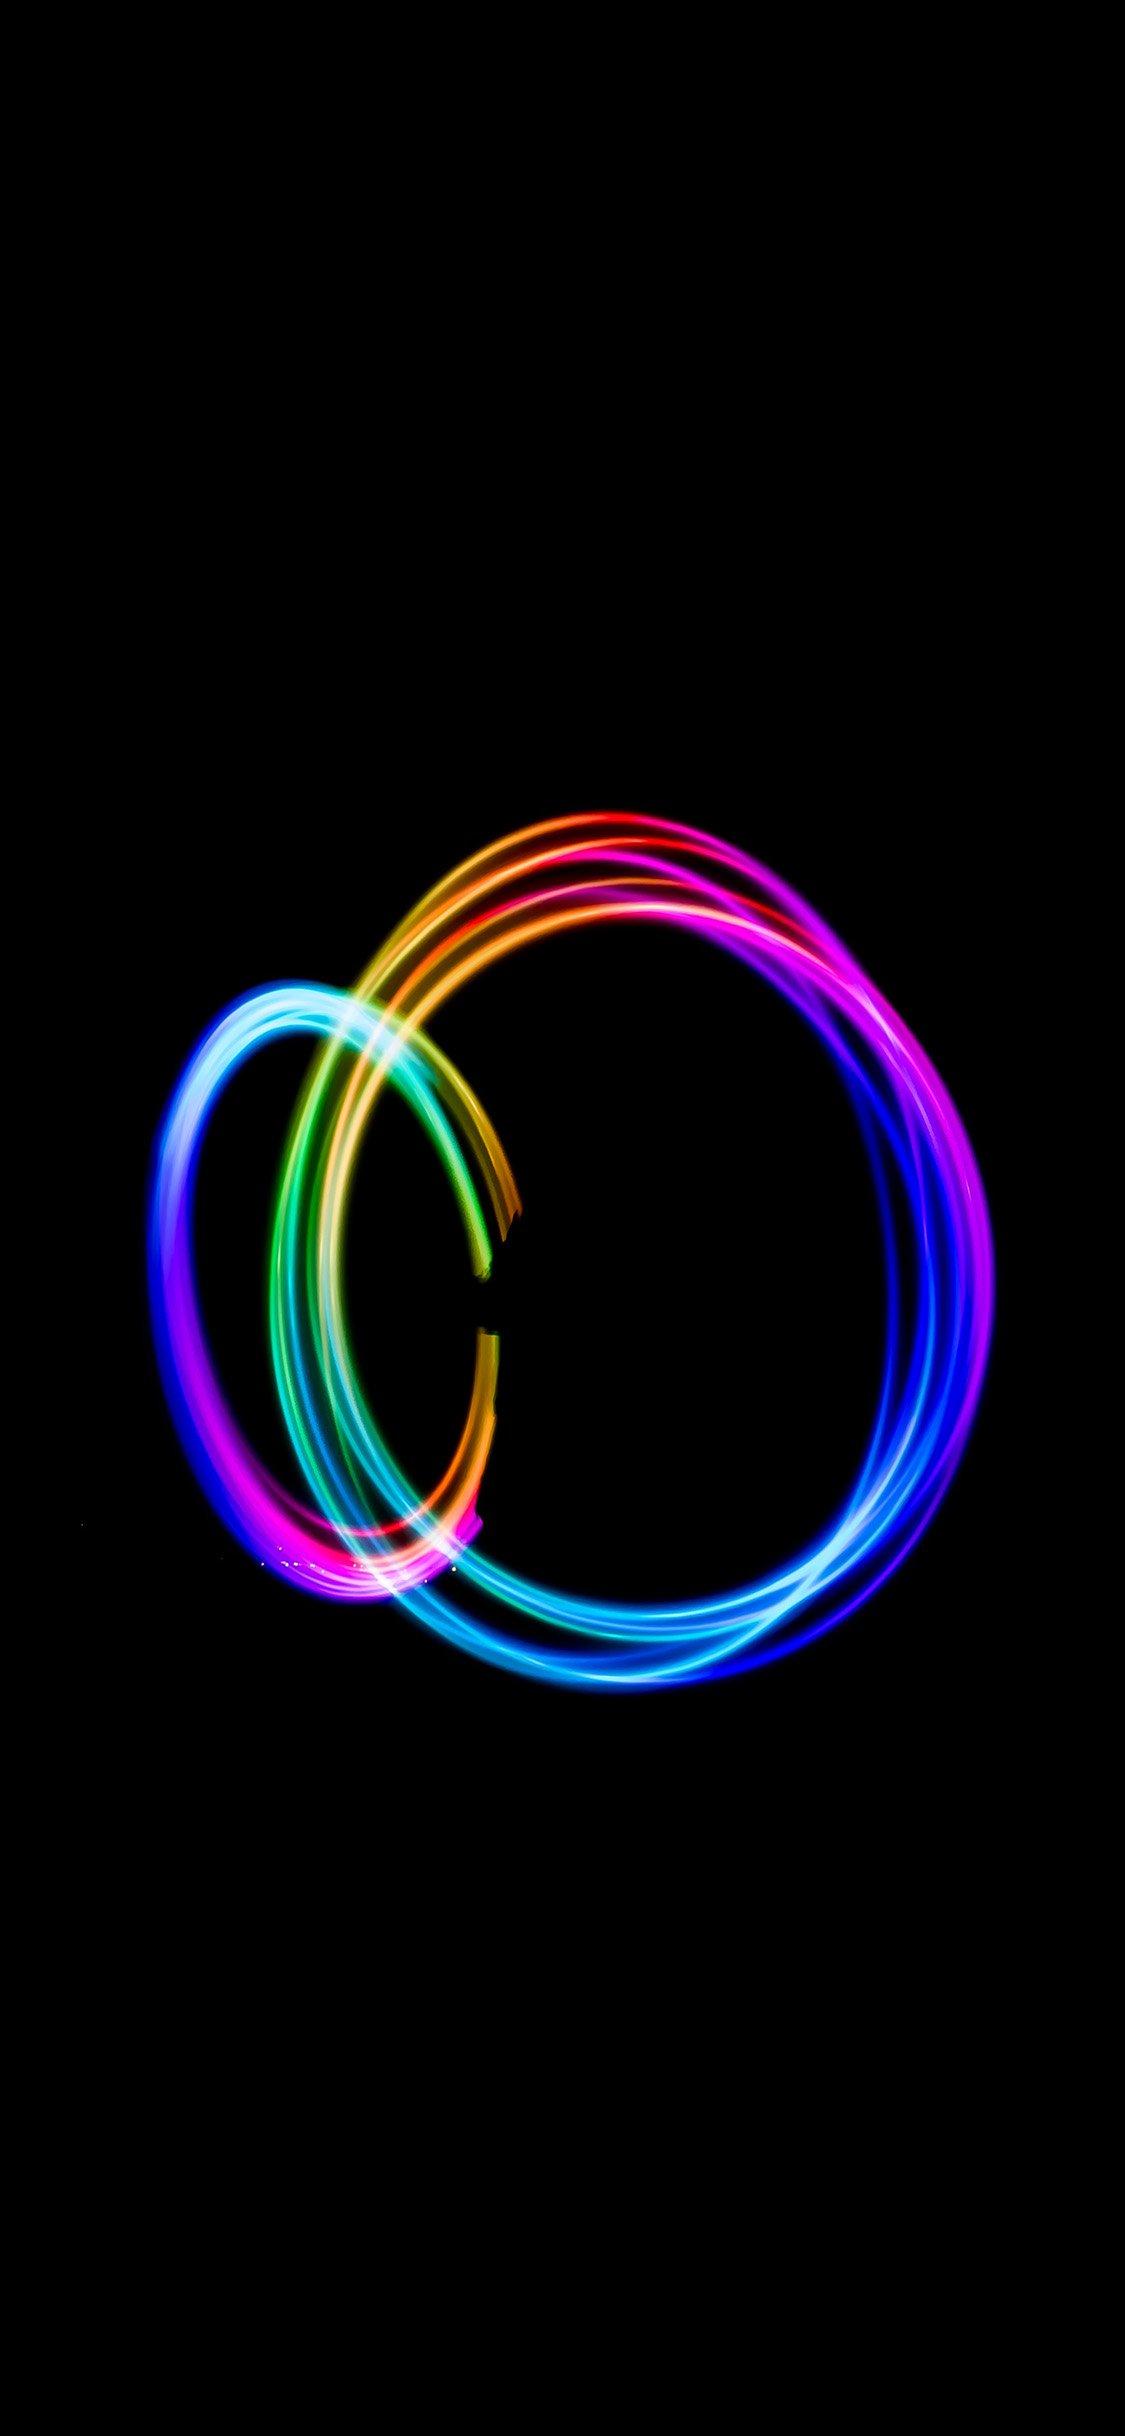 Dark circle rainbow art iPhone X wallpaper